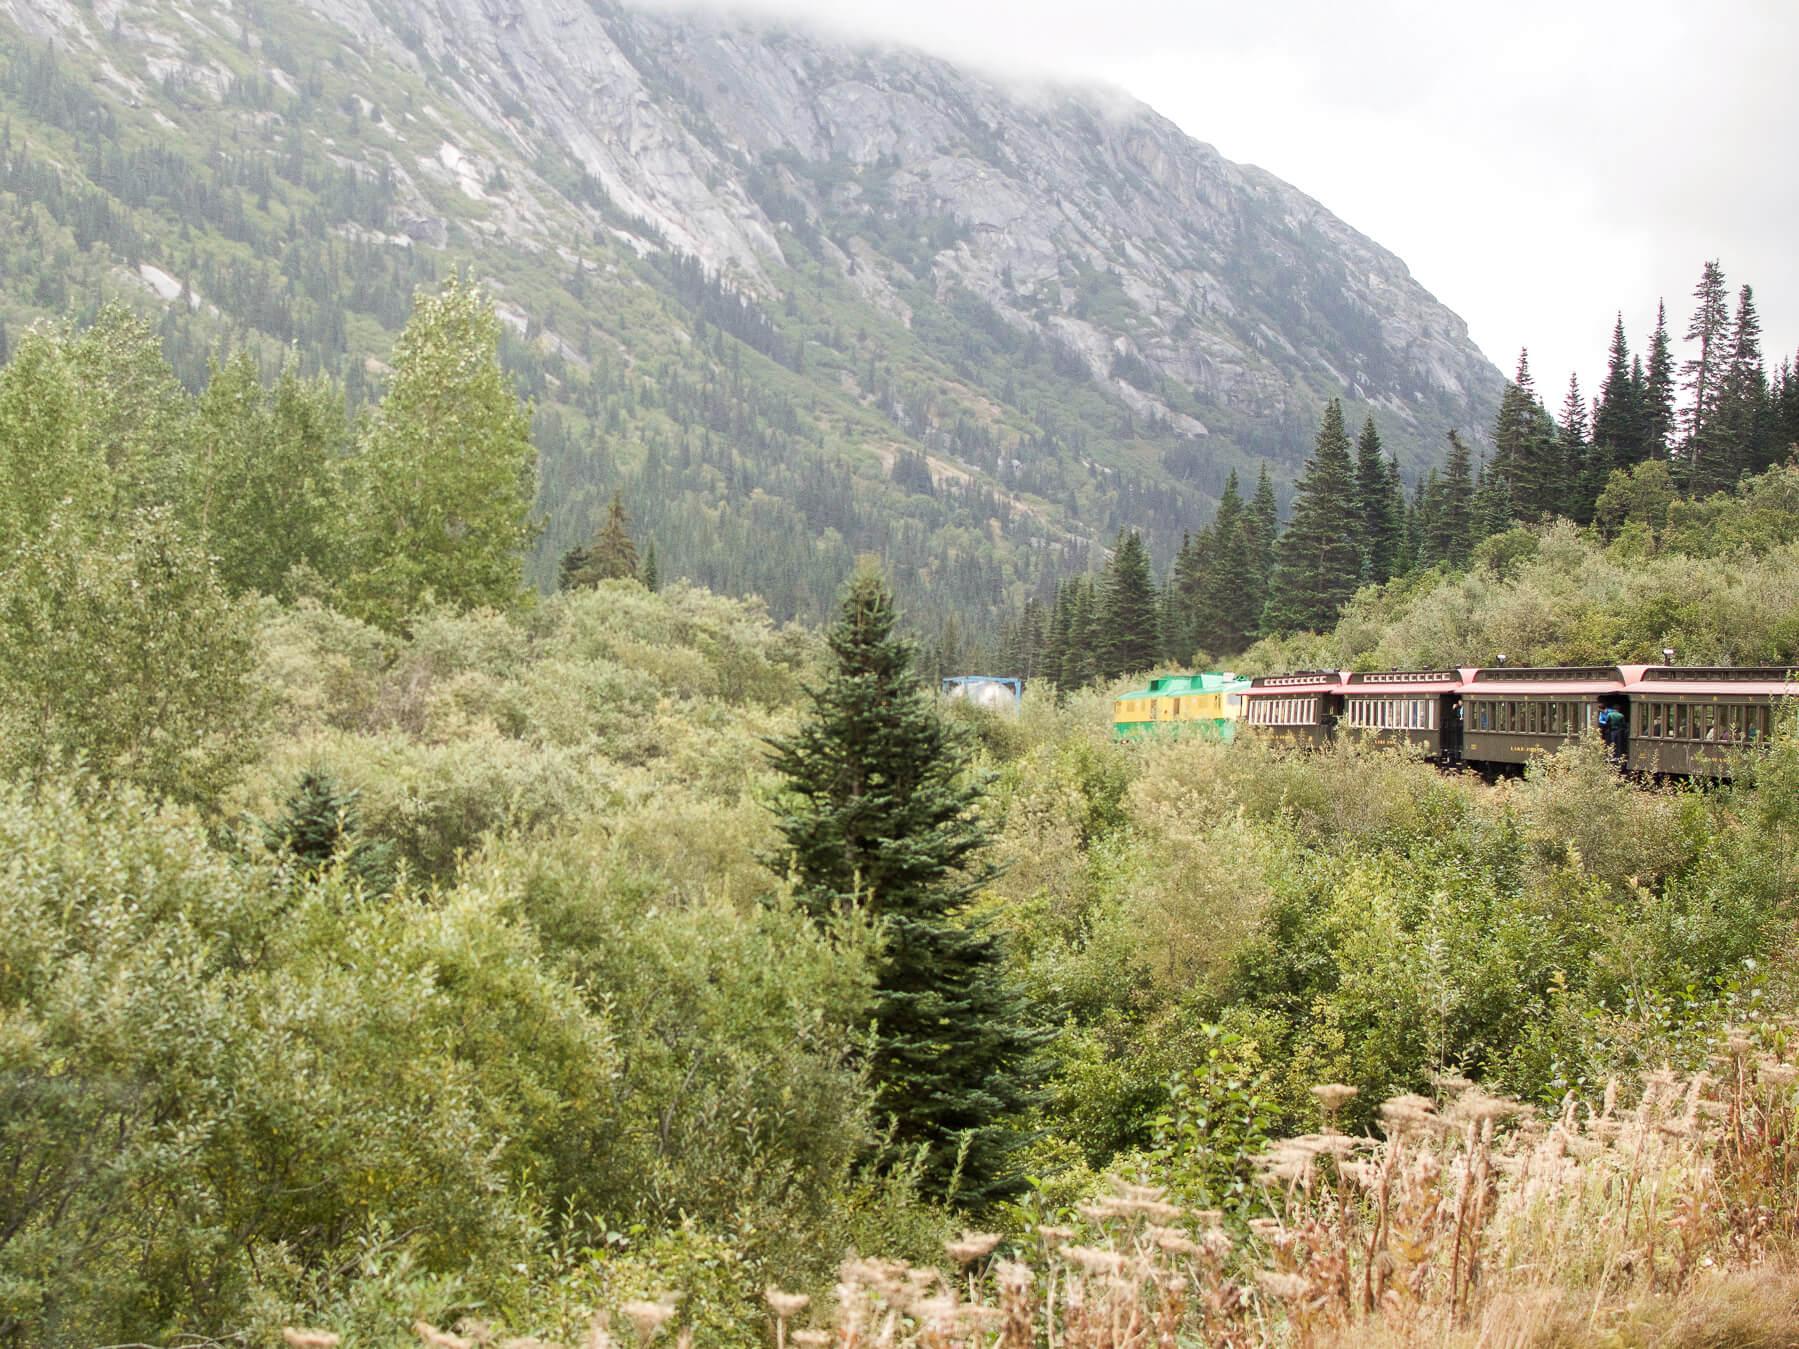 Old train chugging through the Alaskan Valley